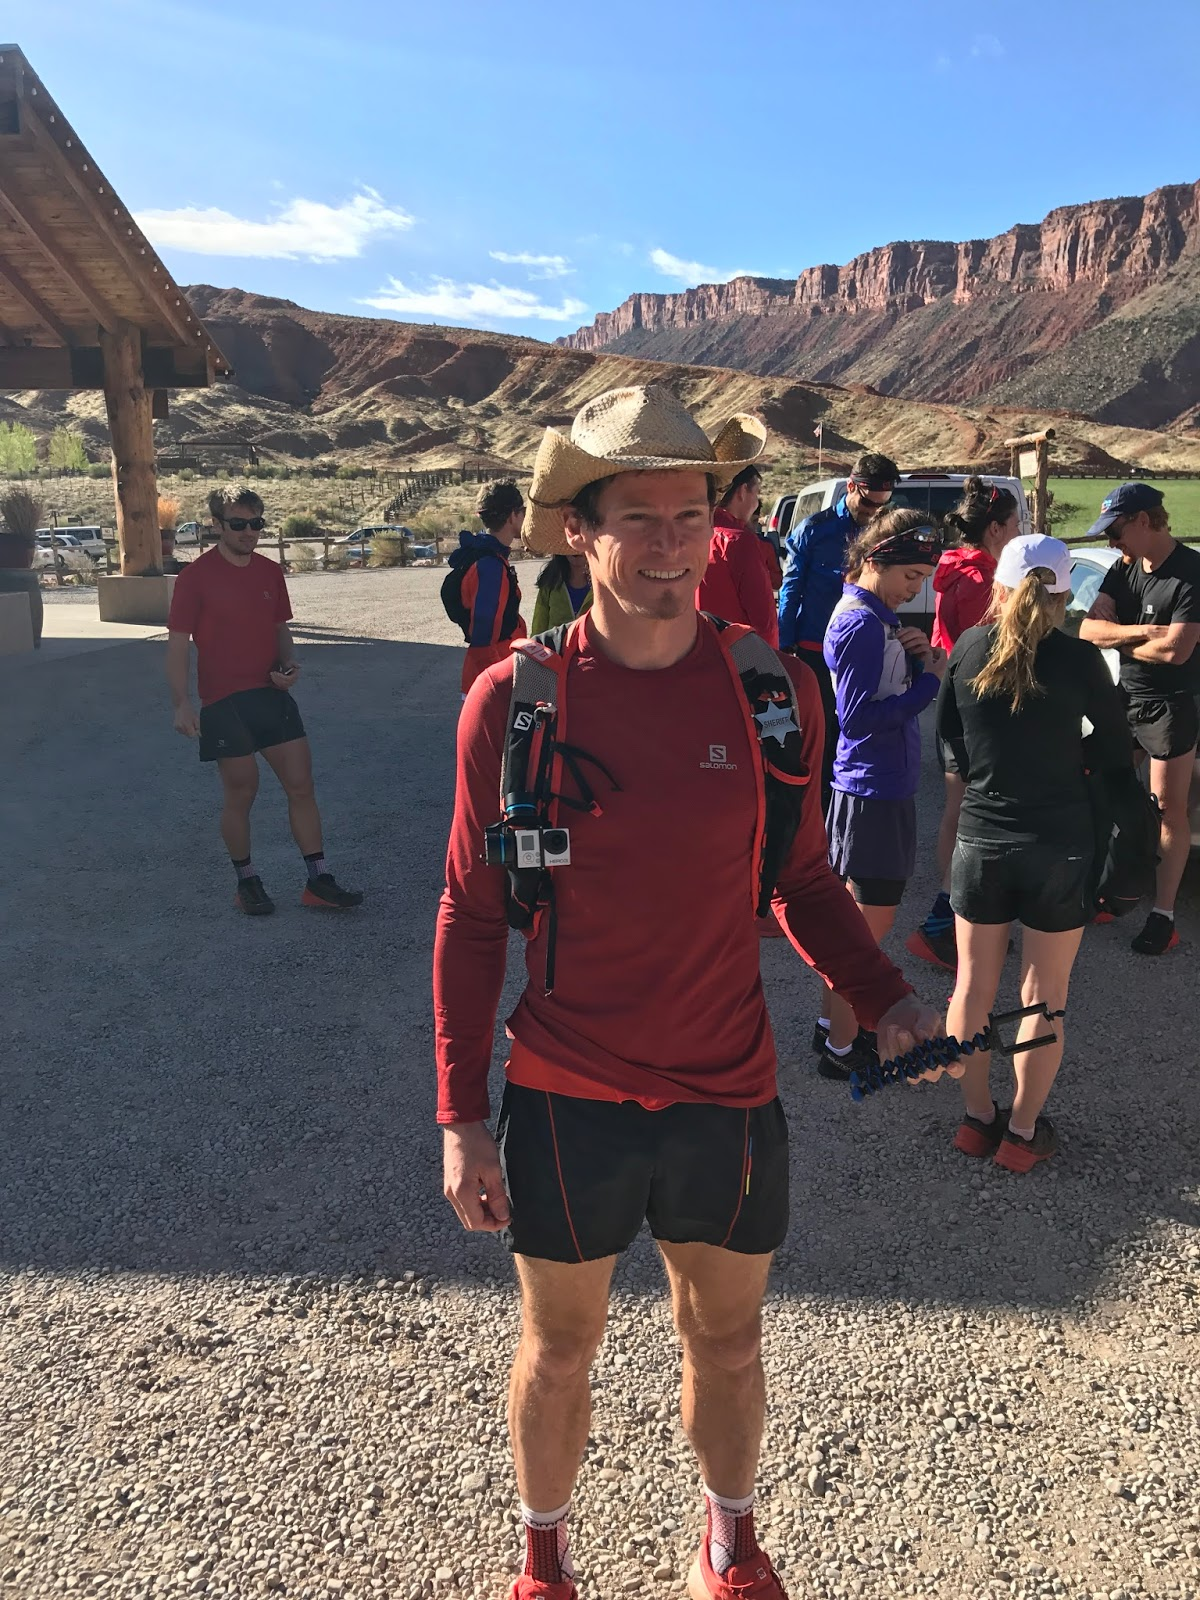 2e4a7824890d Road Trail Run  Salomon Ultra Running Academy 2017 Moab  Summary ...